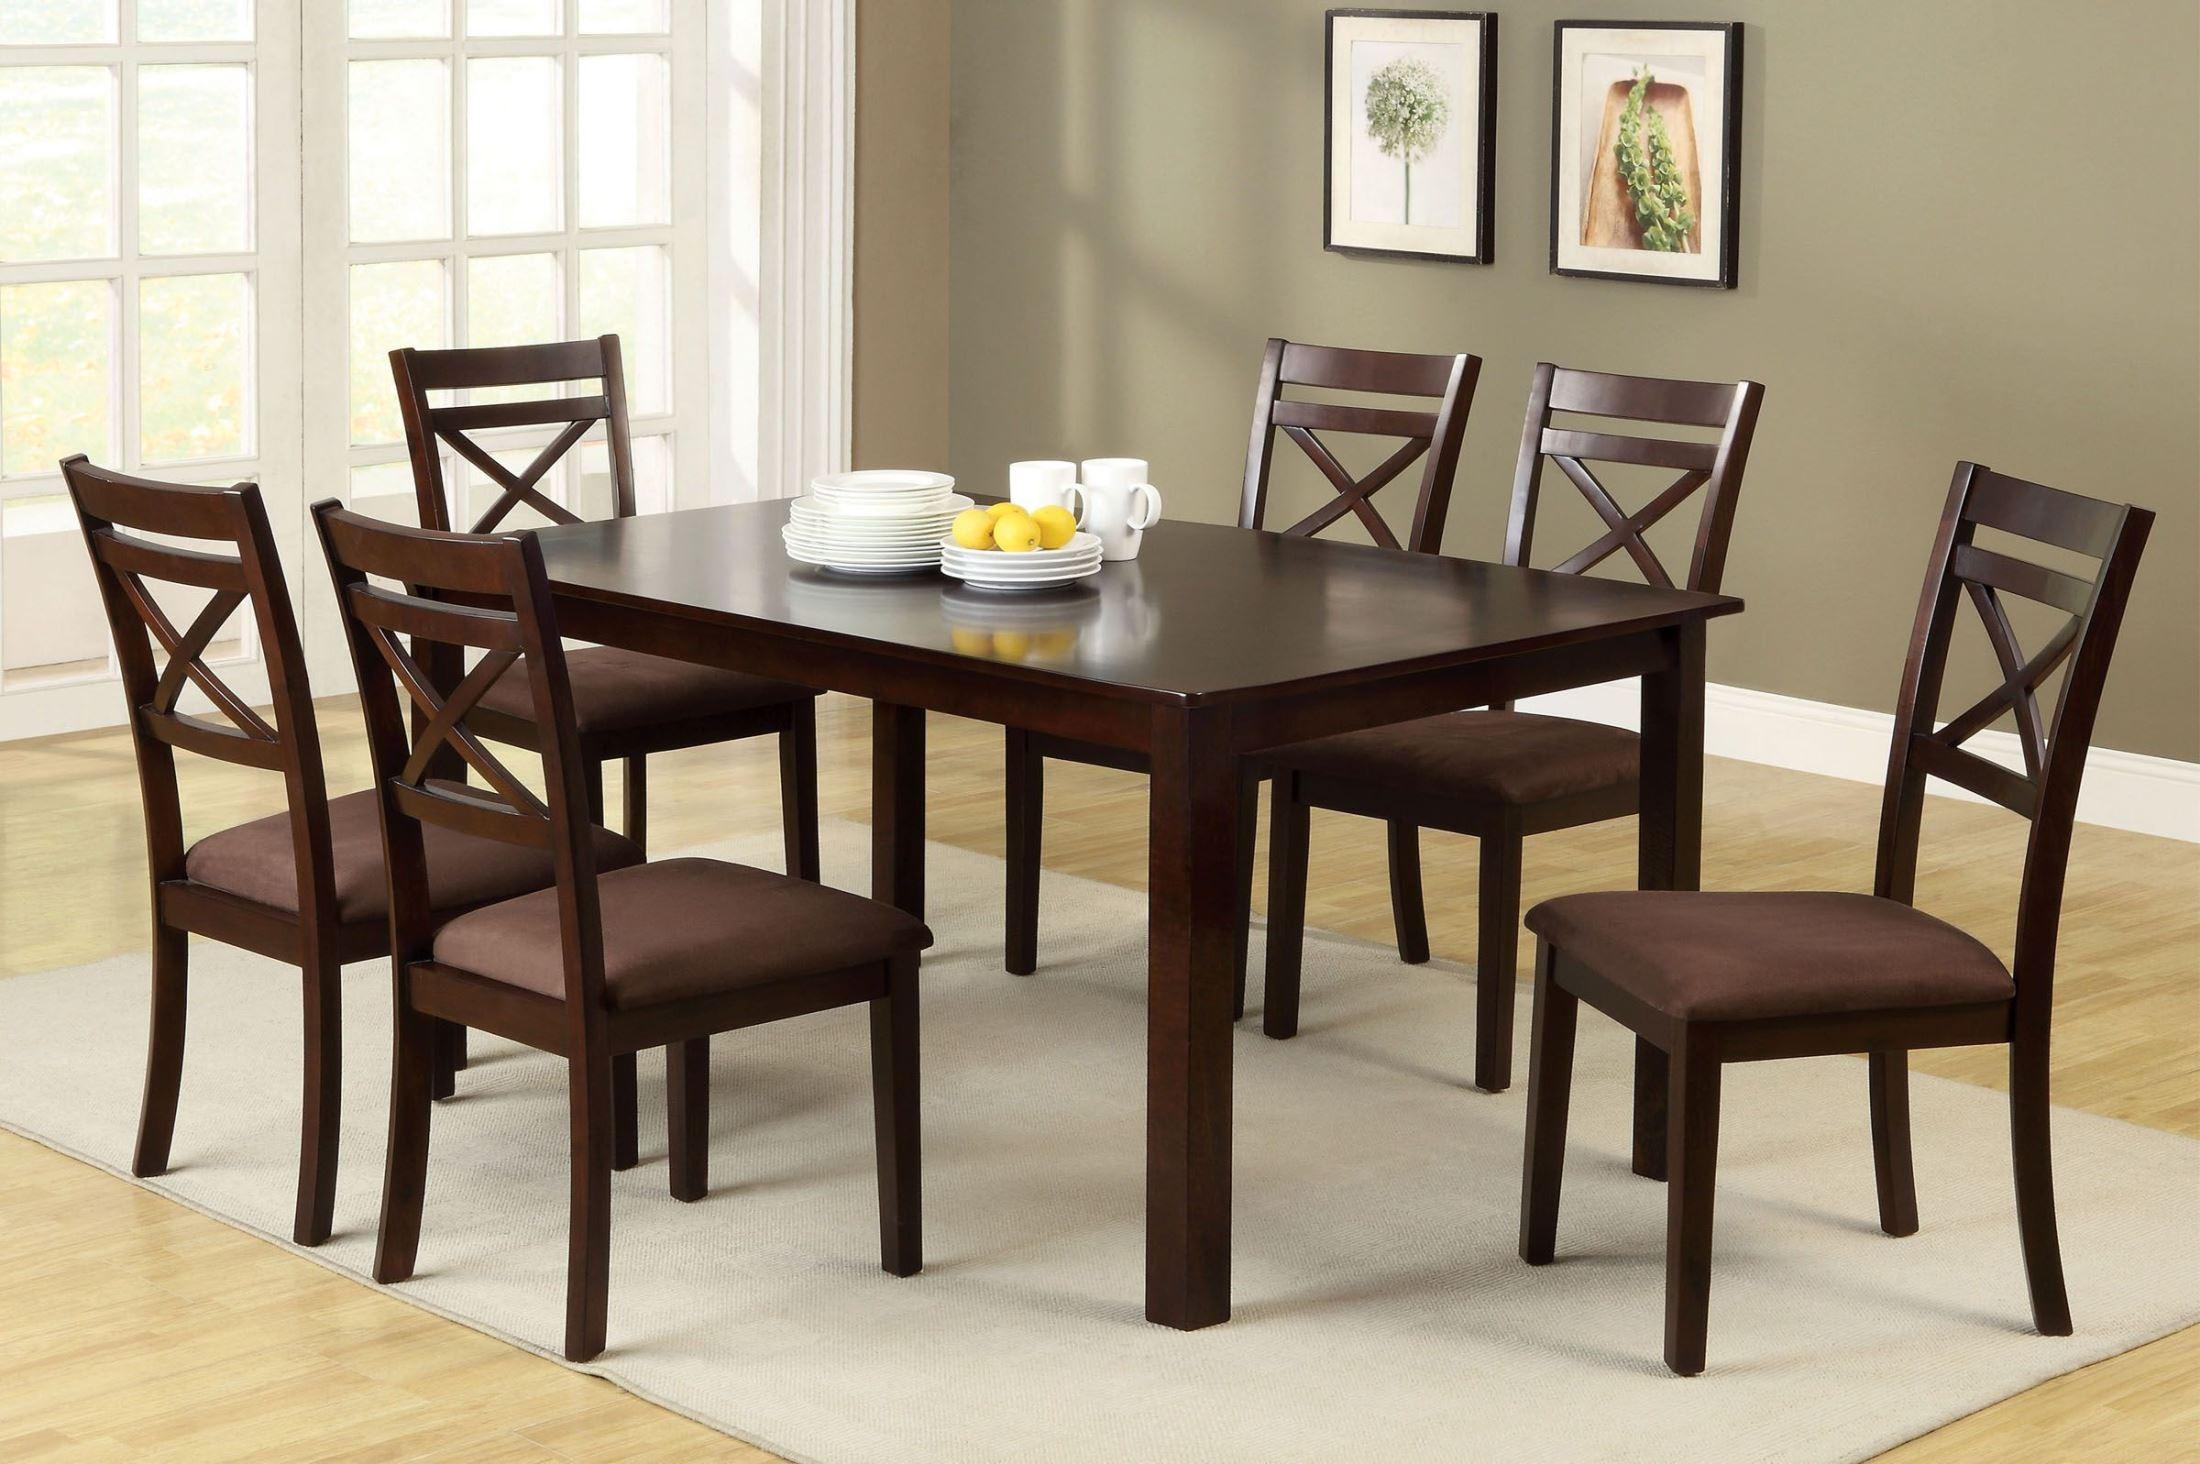 Furniture Of America Weston Ii 7 Piece Dining Table Set Weston